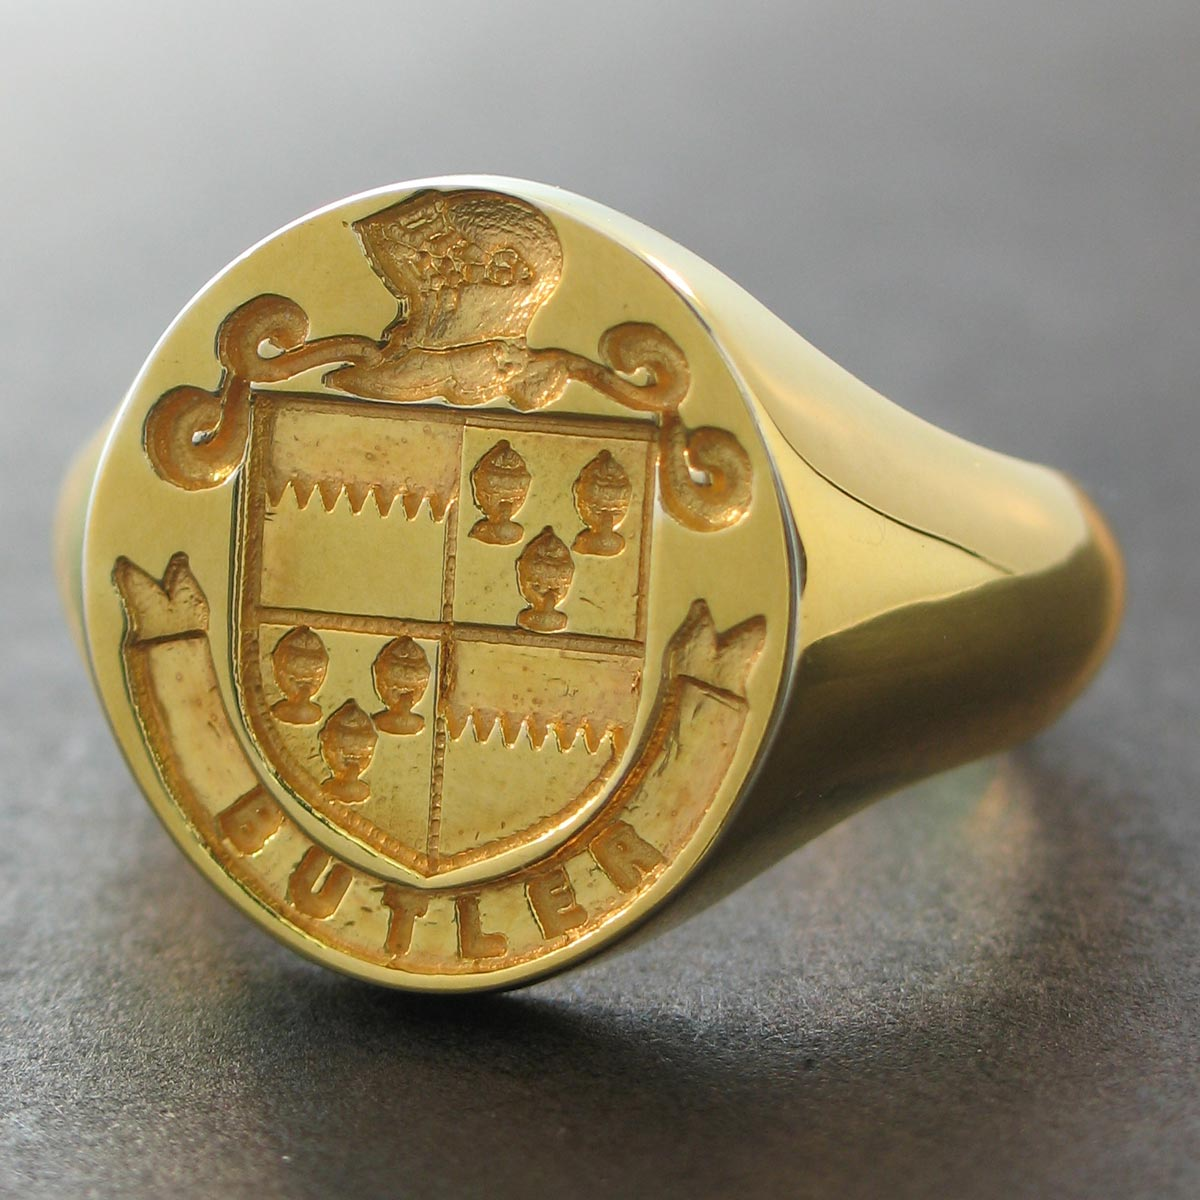 Custom Made Irish Coat of Arms Rings - Gold